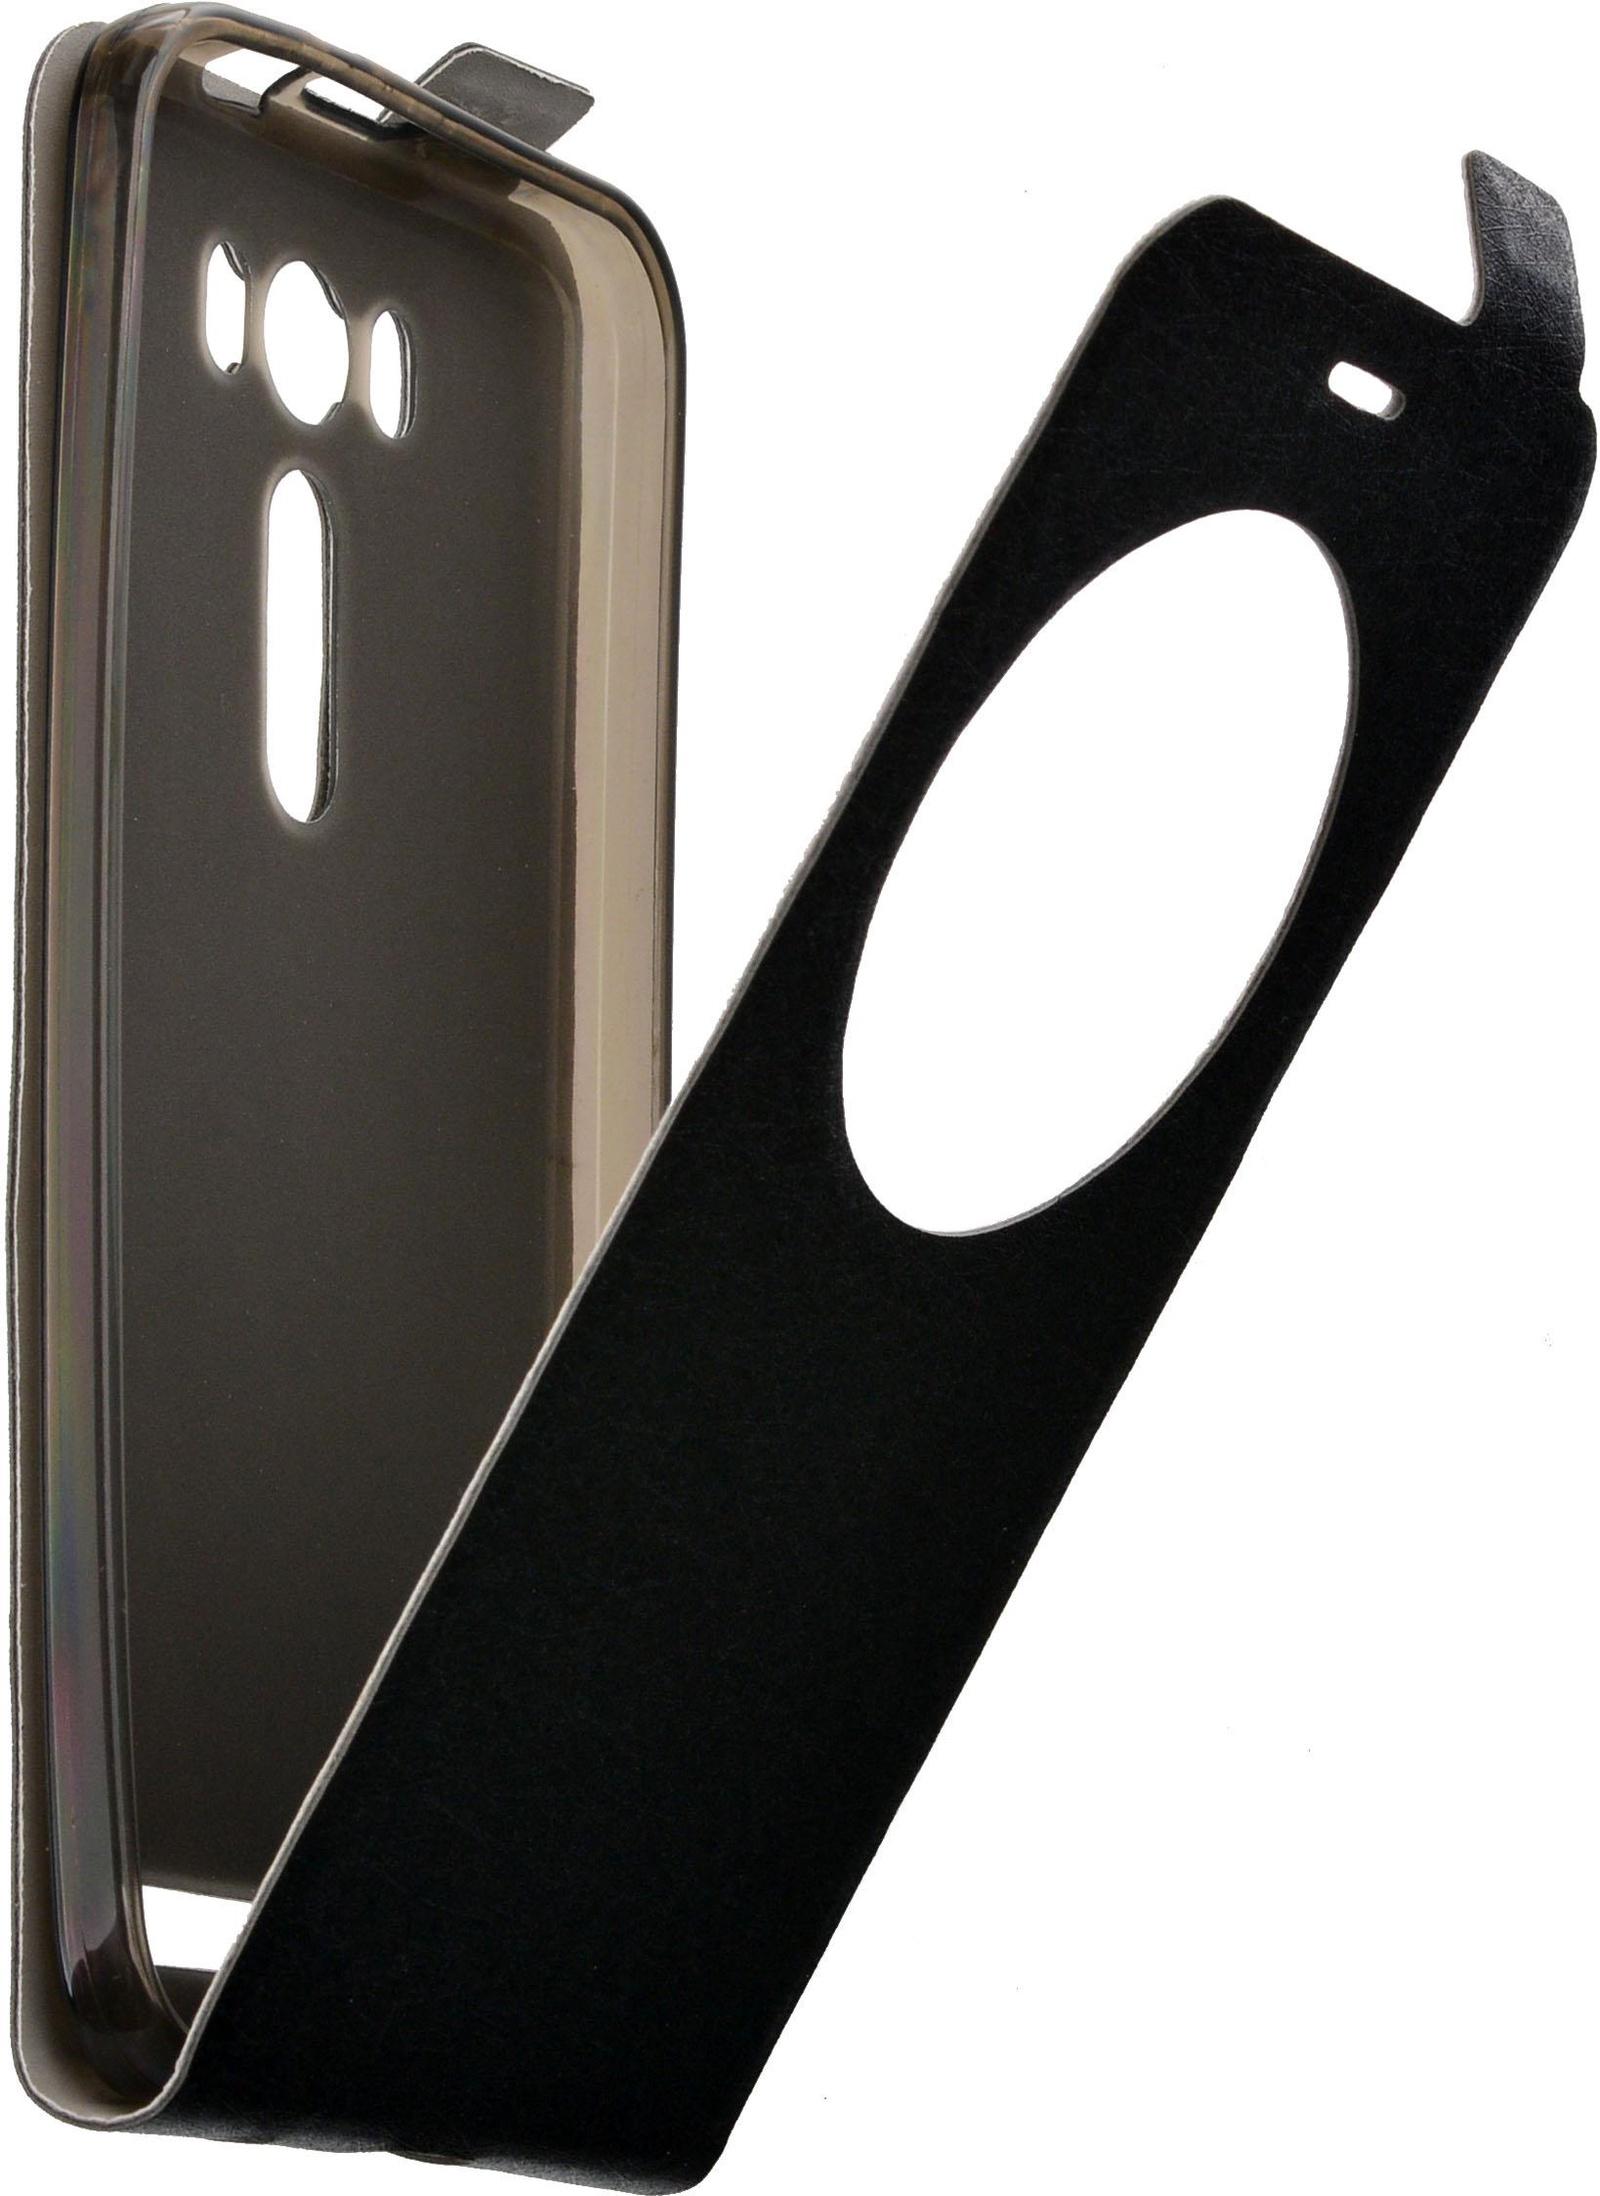 Чехол для сотового телефона skinBOX Flip slim AW, 4660041407112, черный roar aw чехол для asus zenfone 4 a400cg white